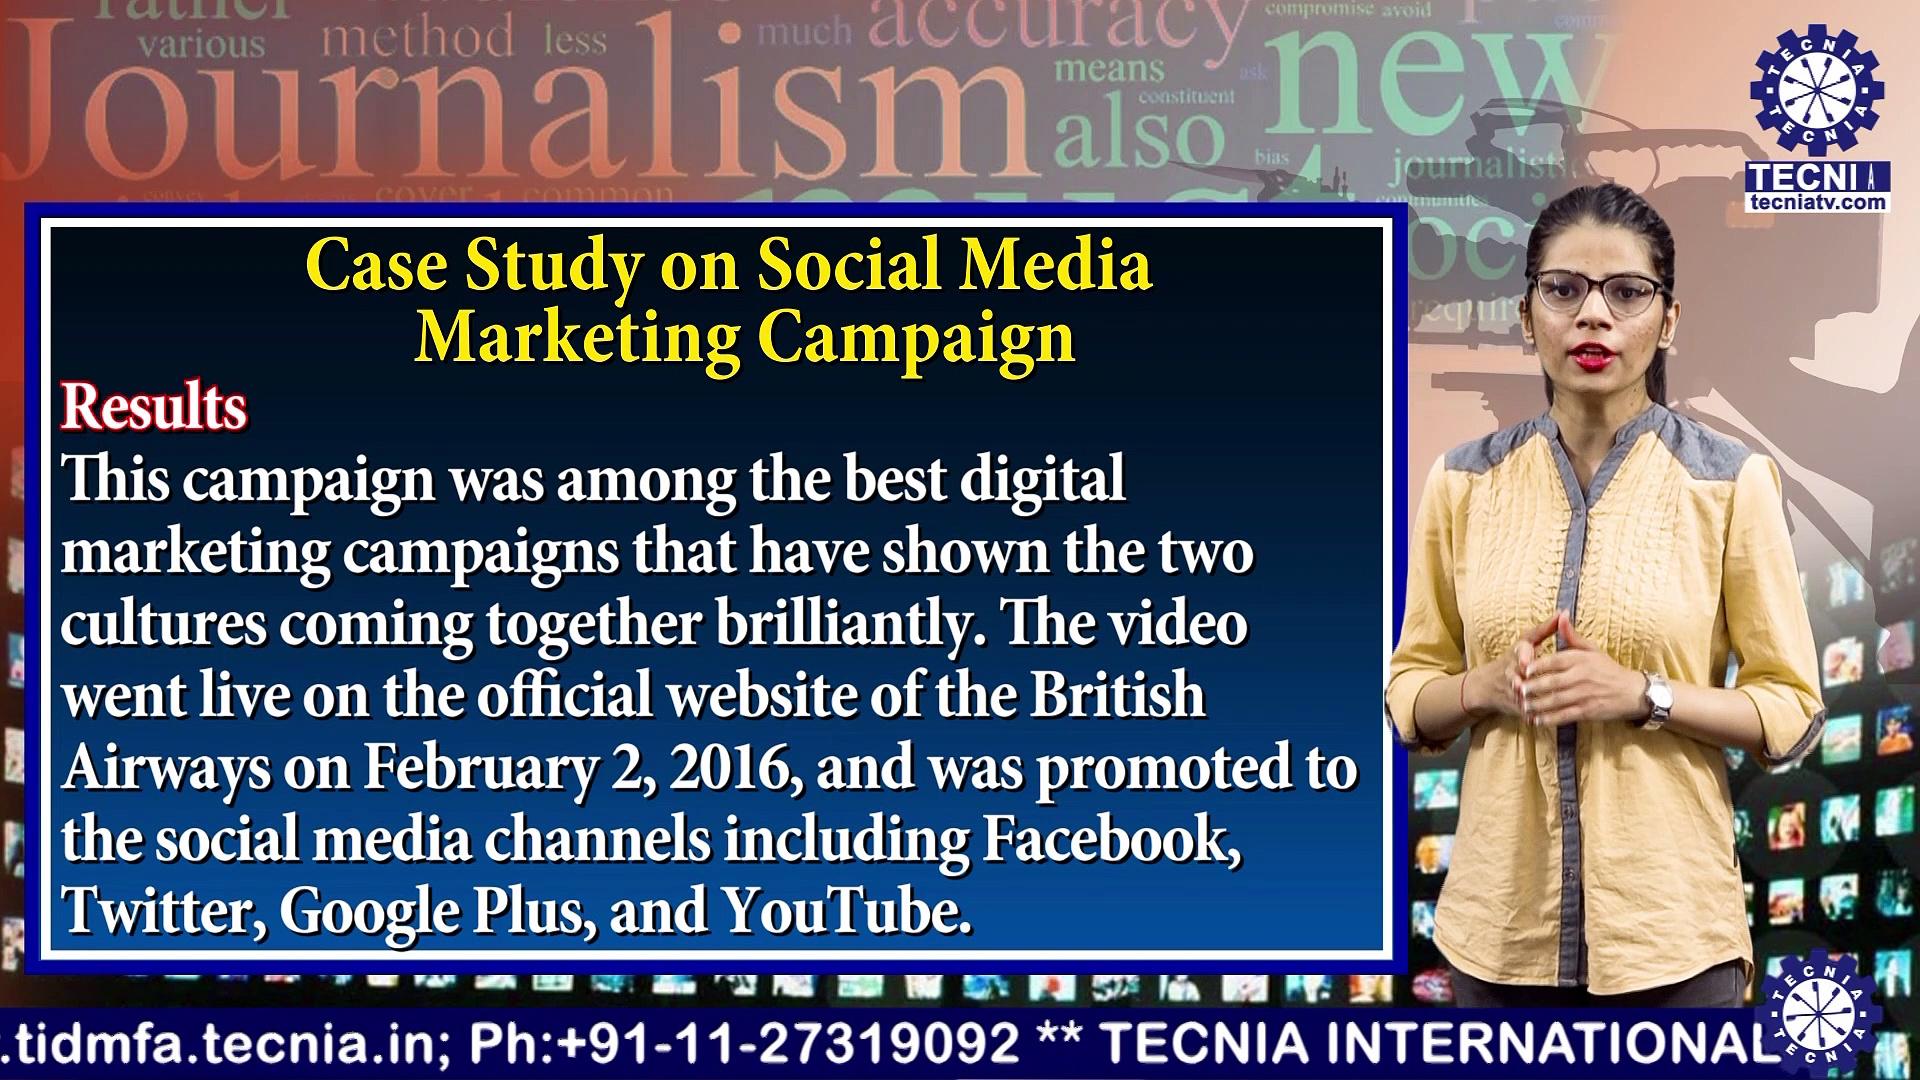 BAJMC || Ms. Mansi Chopra || CASE STUDY ON SOCIAL MEDIA MARKETING CAMPAIGN || TIAS || TECNIA TV